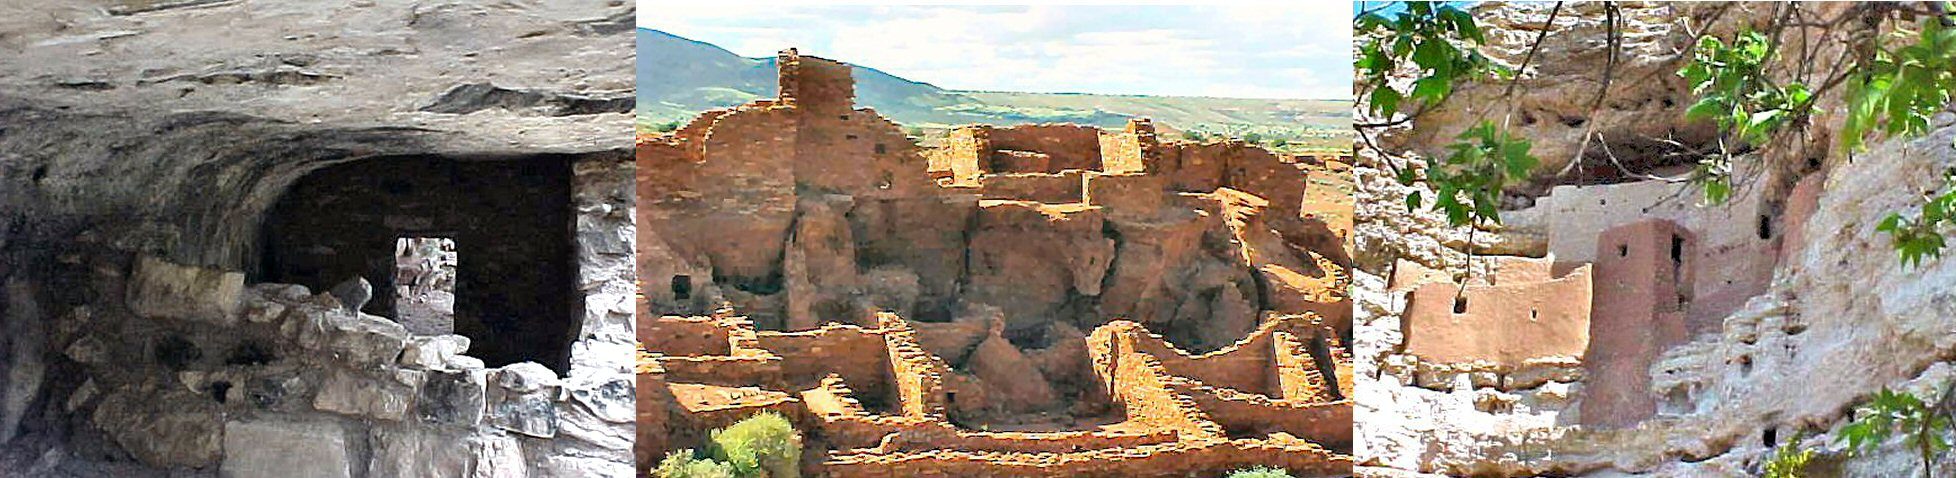 Sinagua Ruins (Hopi ancestors) at Walnut Canyon, Wupatki, and Montezuma Castle, Arizona